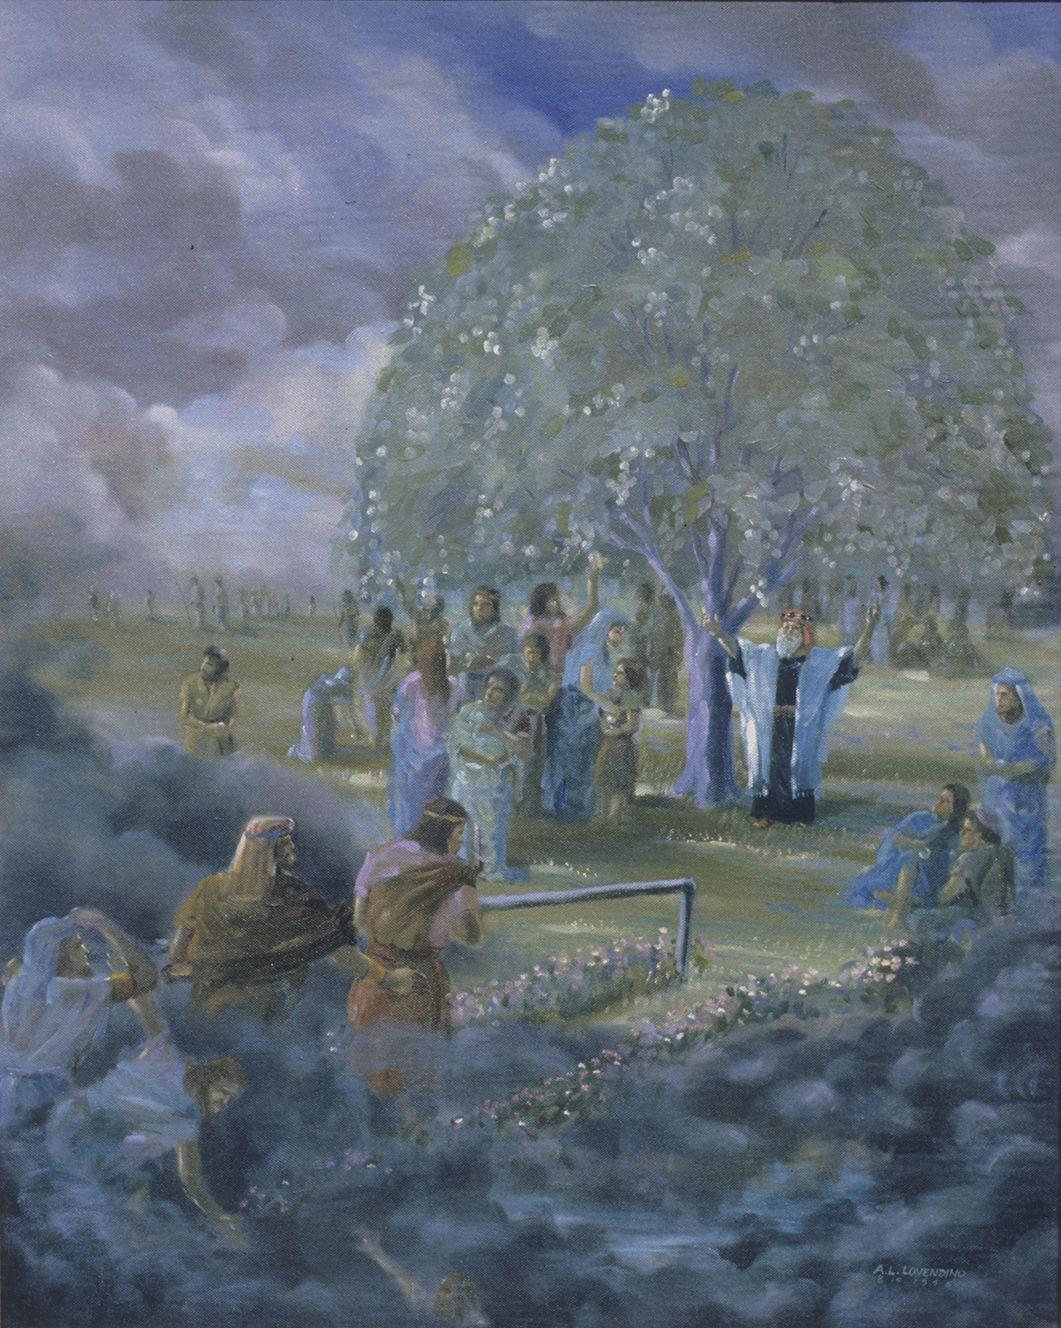 Consectetuer adipiscing elit Tree of life, Art